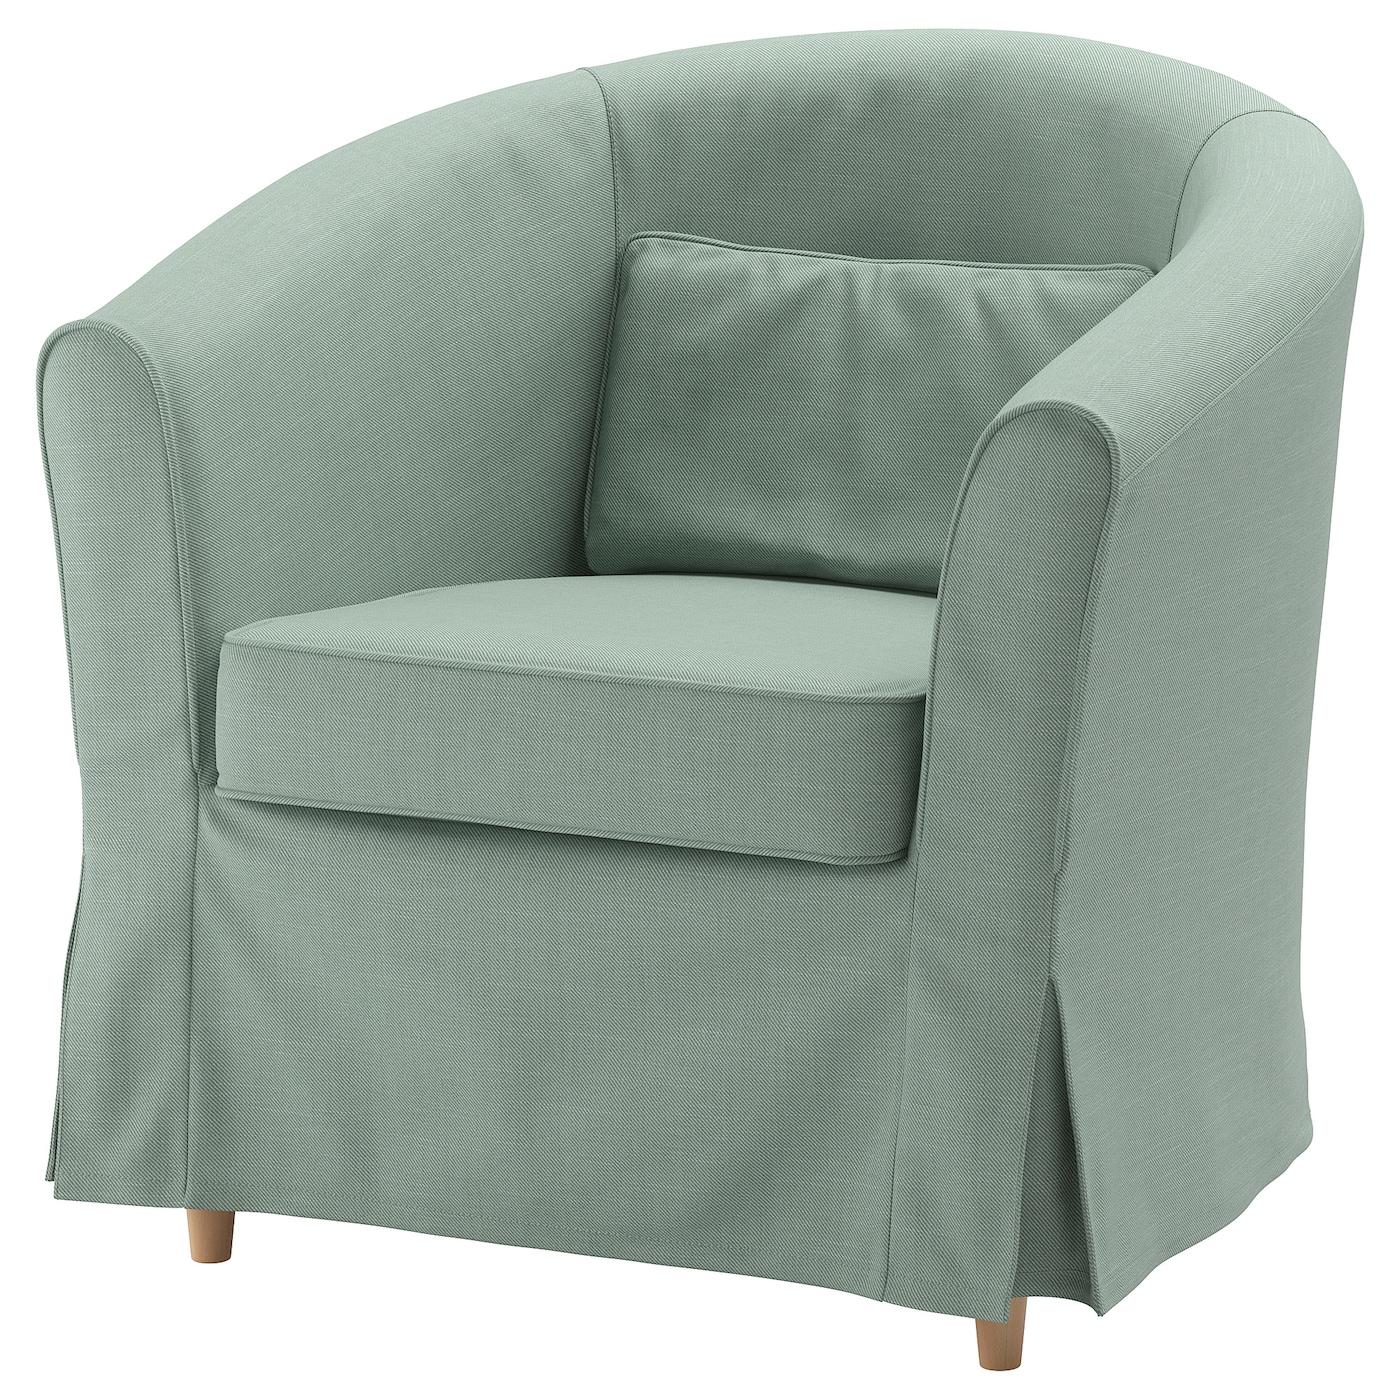 tullsta fauteuil nordvalla lichtgroen ikea. Black Bedroom Furniture Sets. Home Design Ideas